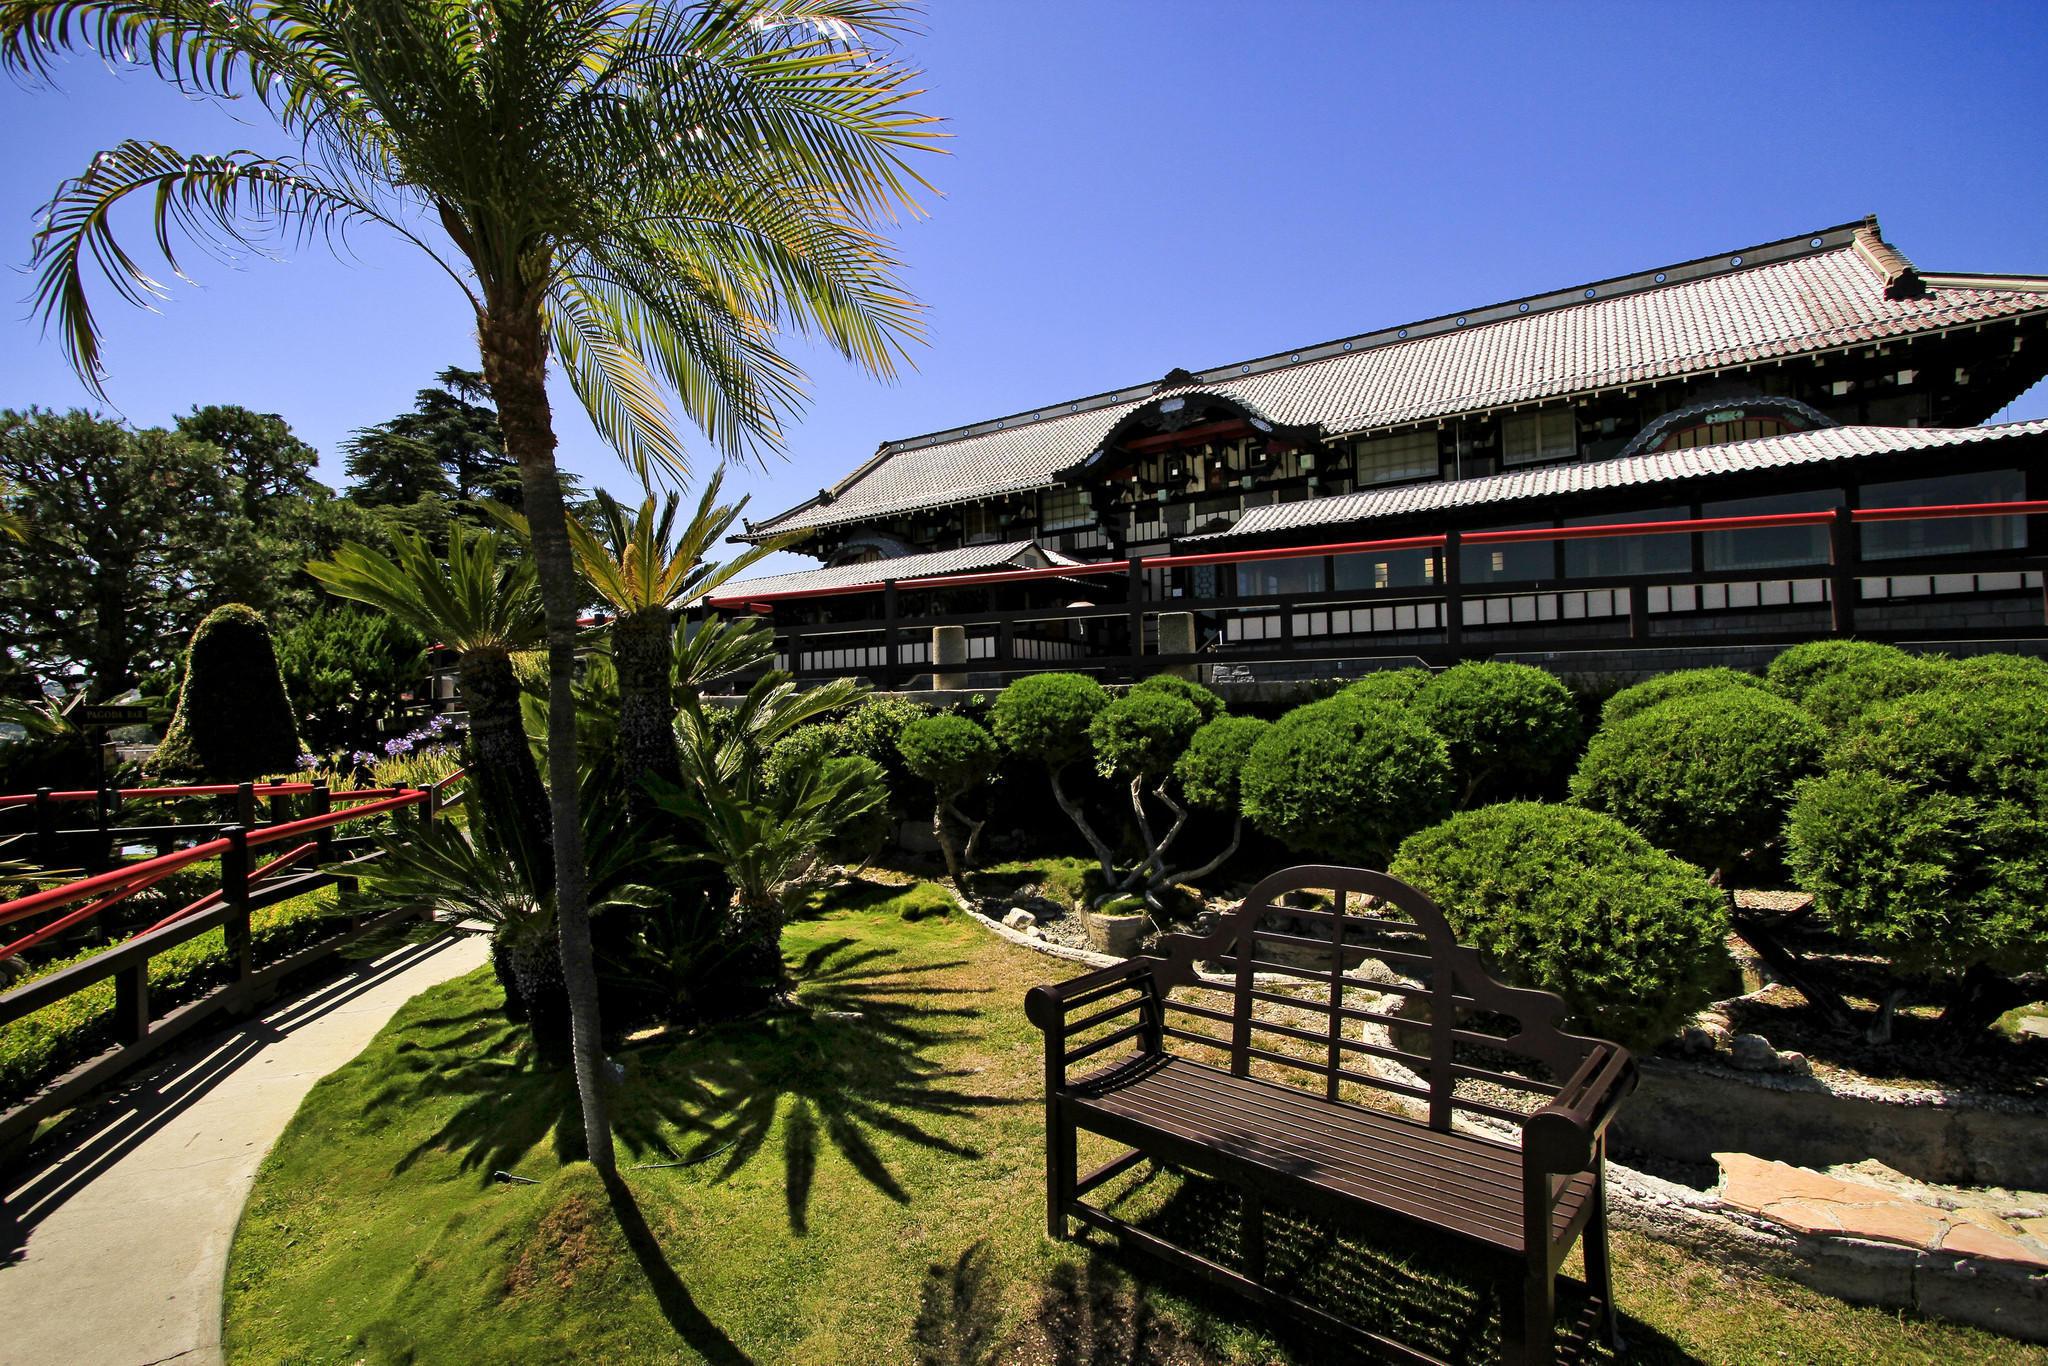 Yamashiro restaurant reopens with new operators - LA Times